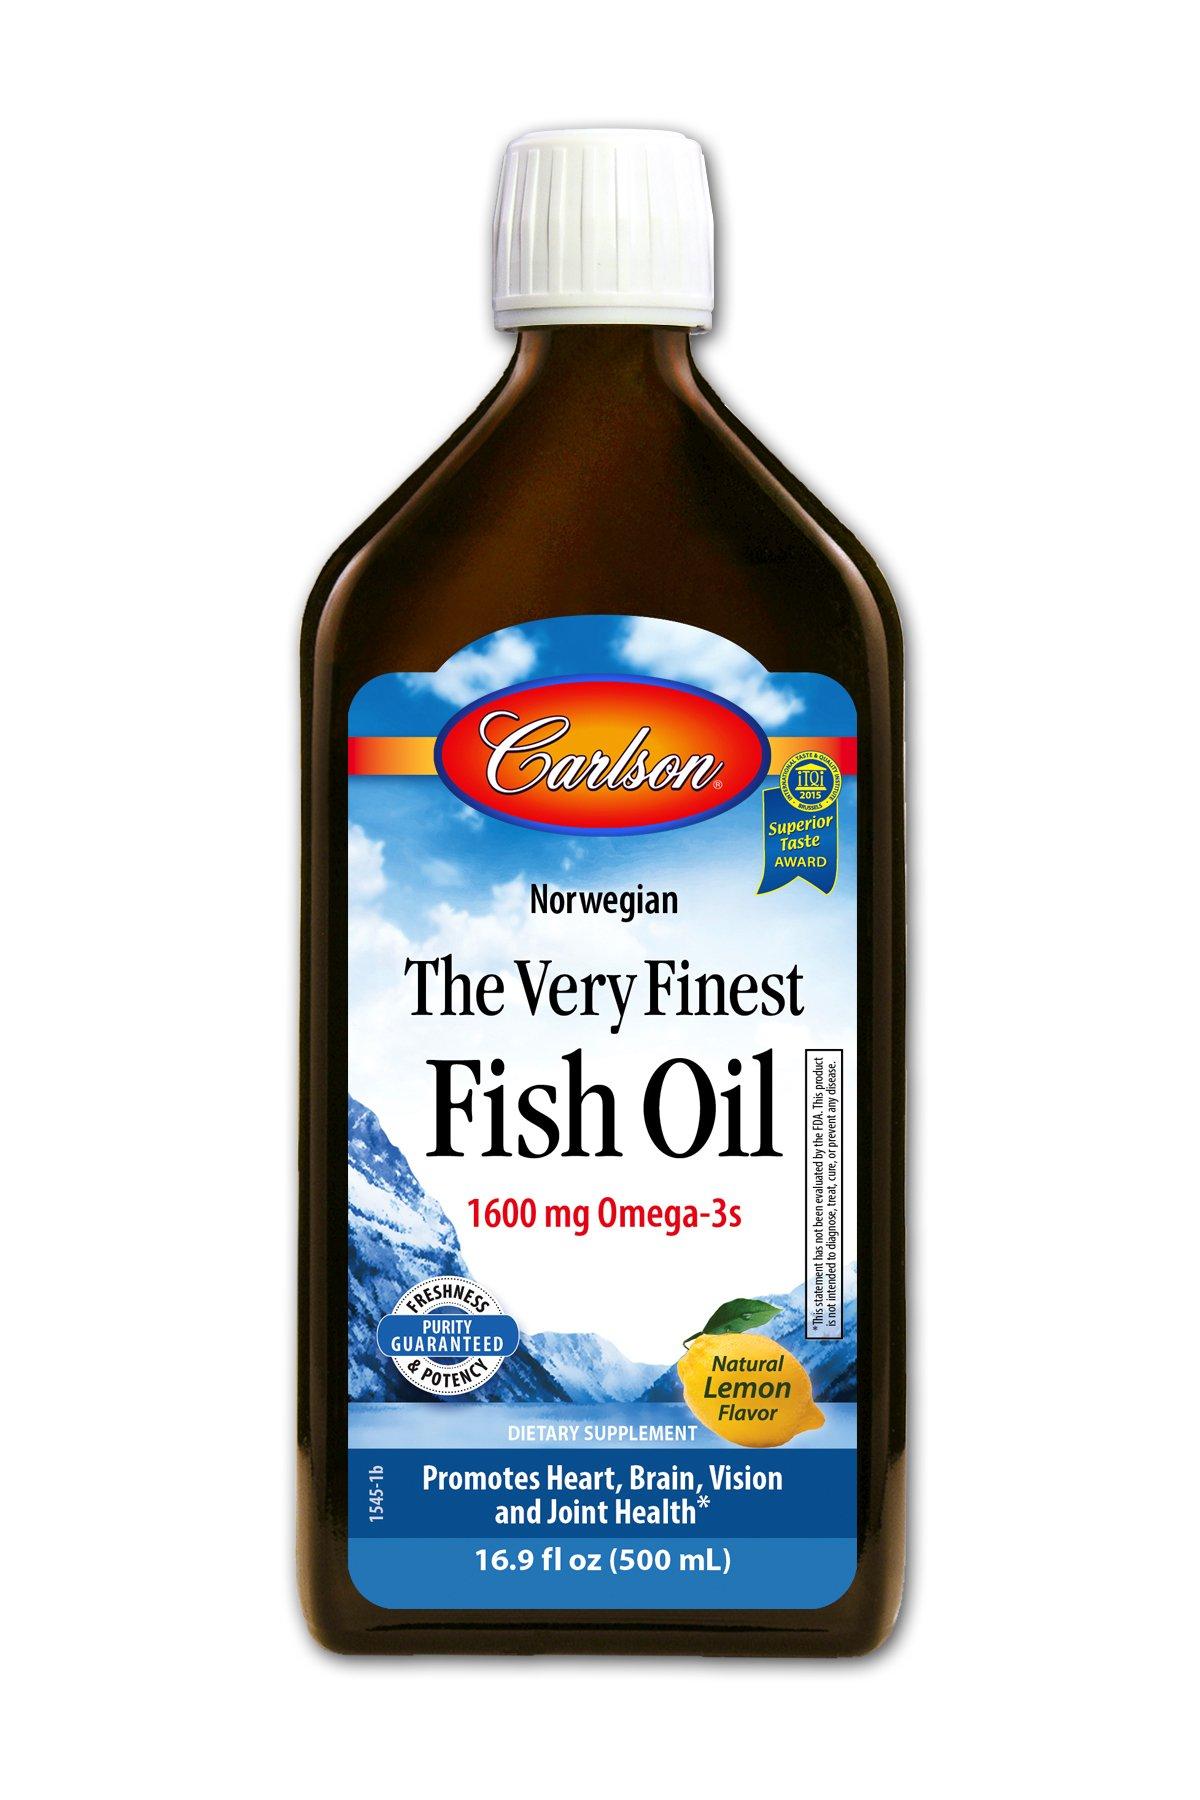 Carlson the very finest fish oil liquid omega for Carlson fish oil amazon